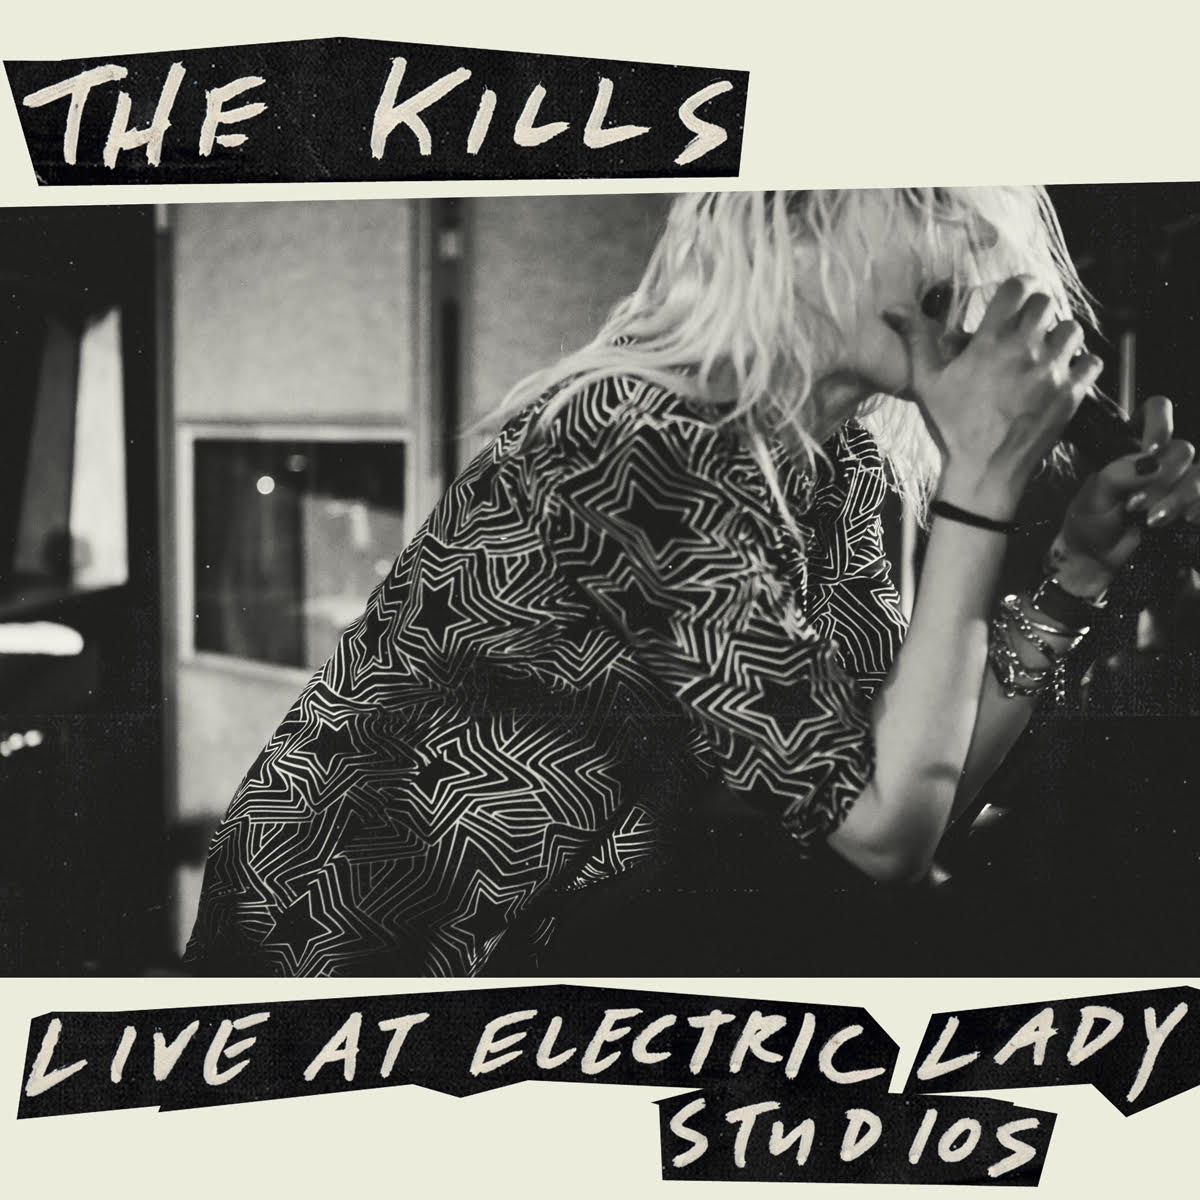 Lady Kills